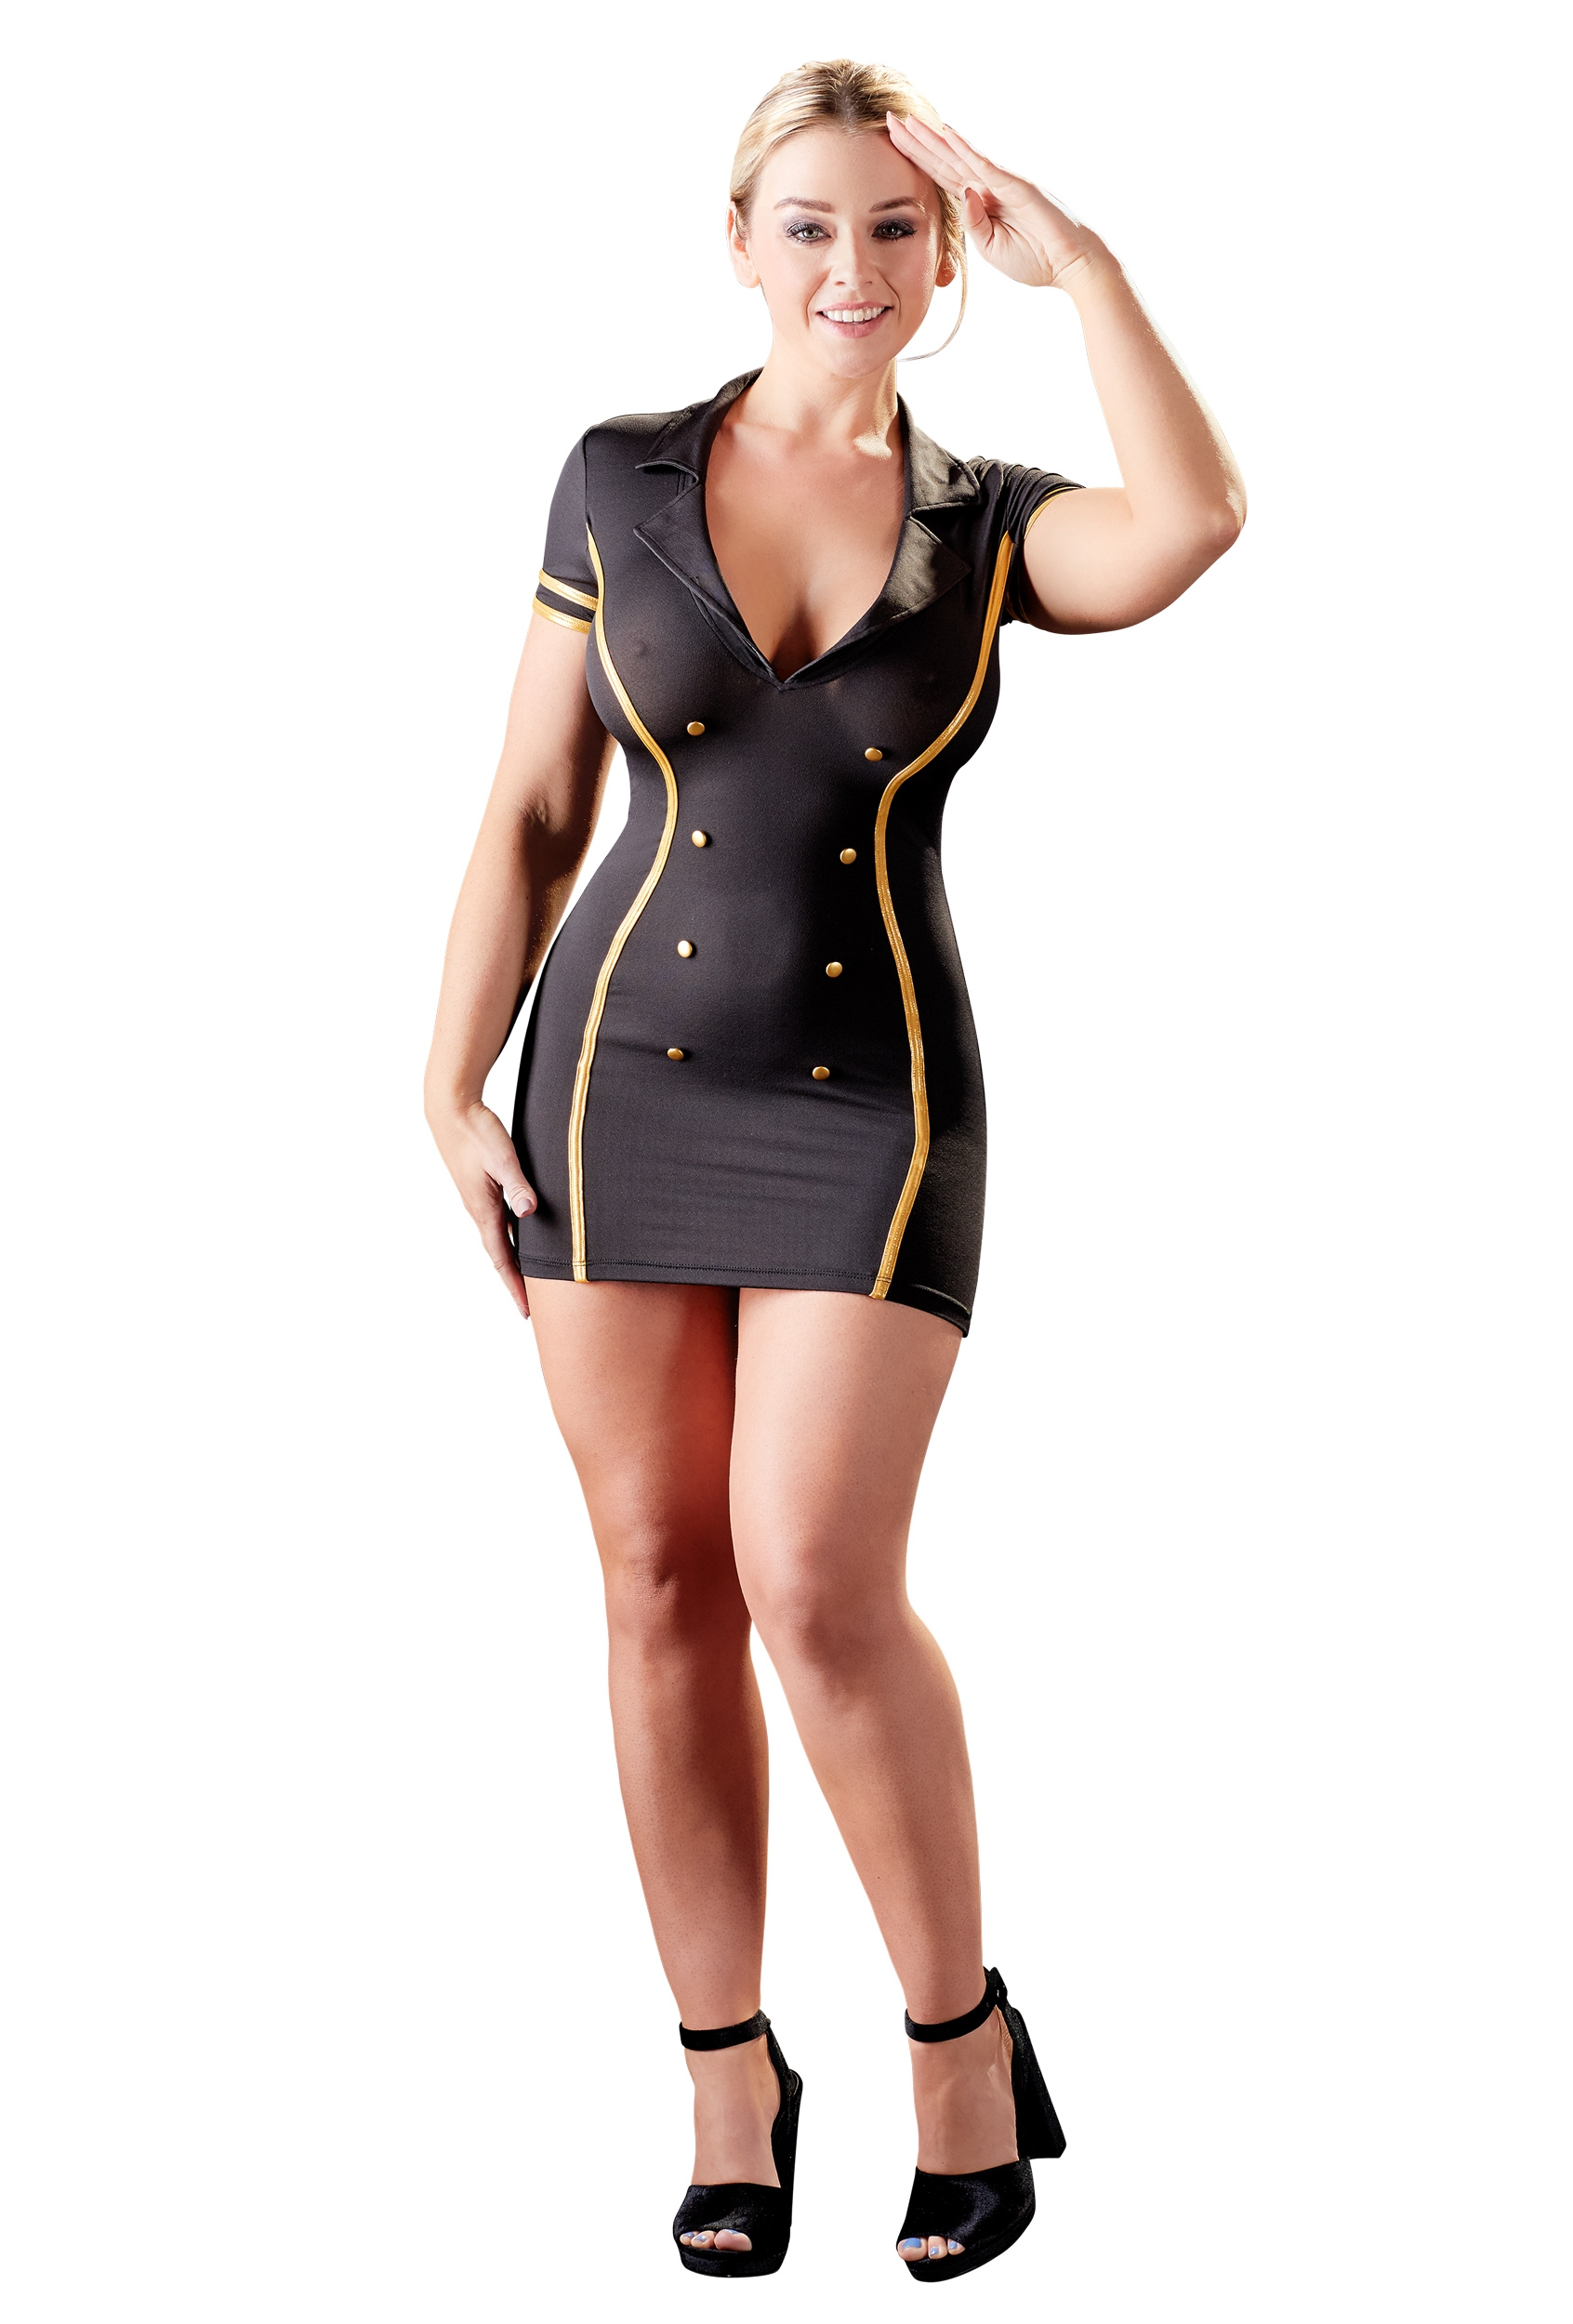 Stewardess Dress | LINGERIE & KLÄDER, KLÄDER TJEJ, Rollspel & Maskerad, Brands, Cottelli Collection | Intimast.se - Sexleksaker